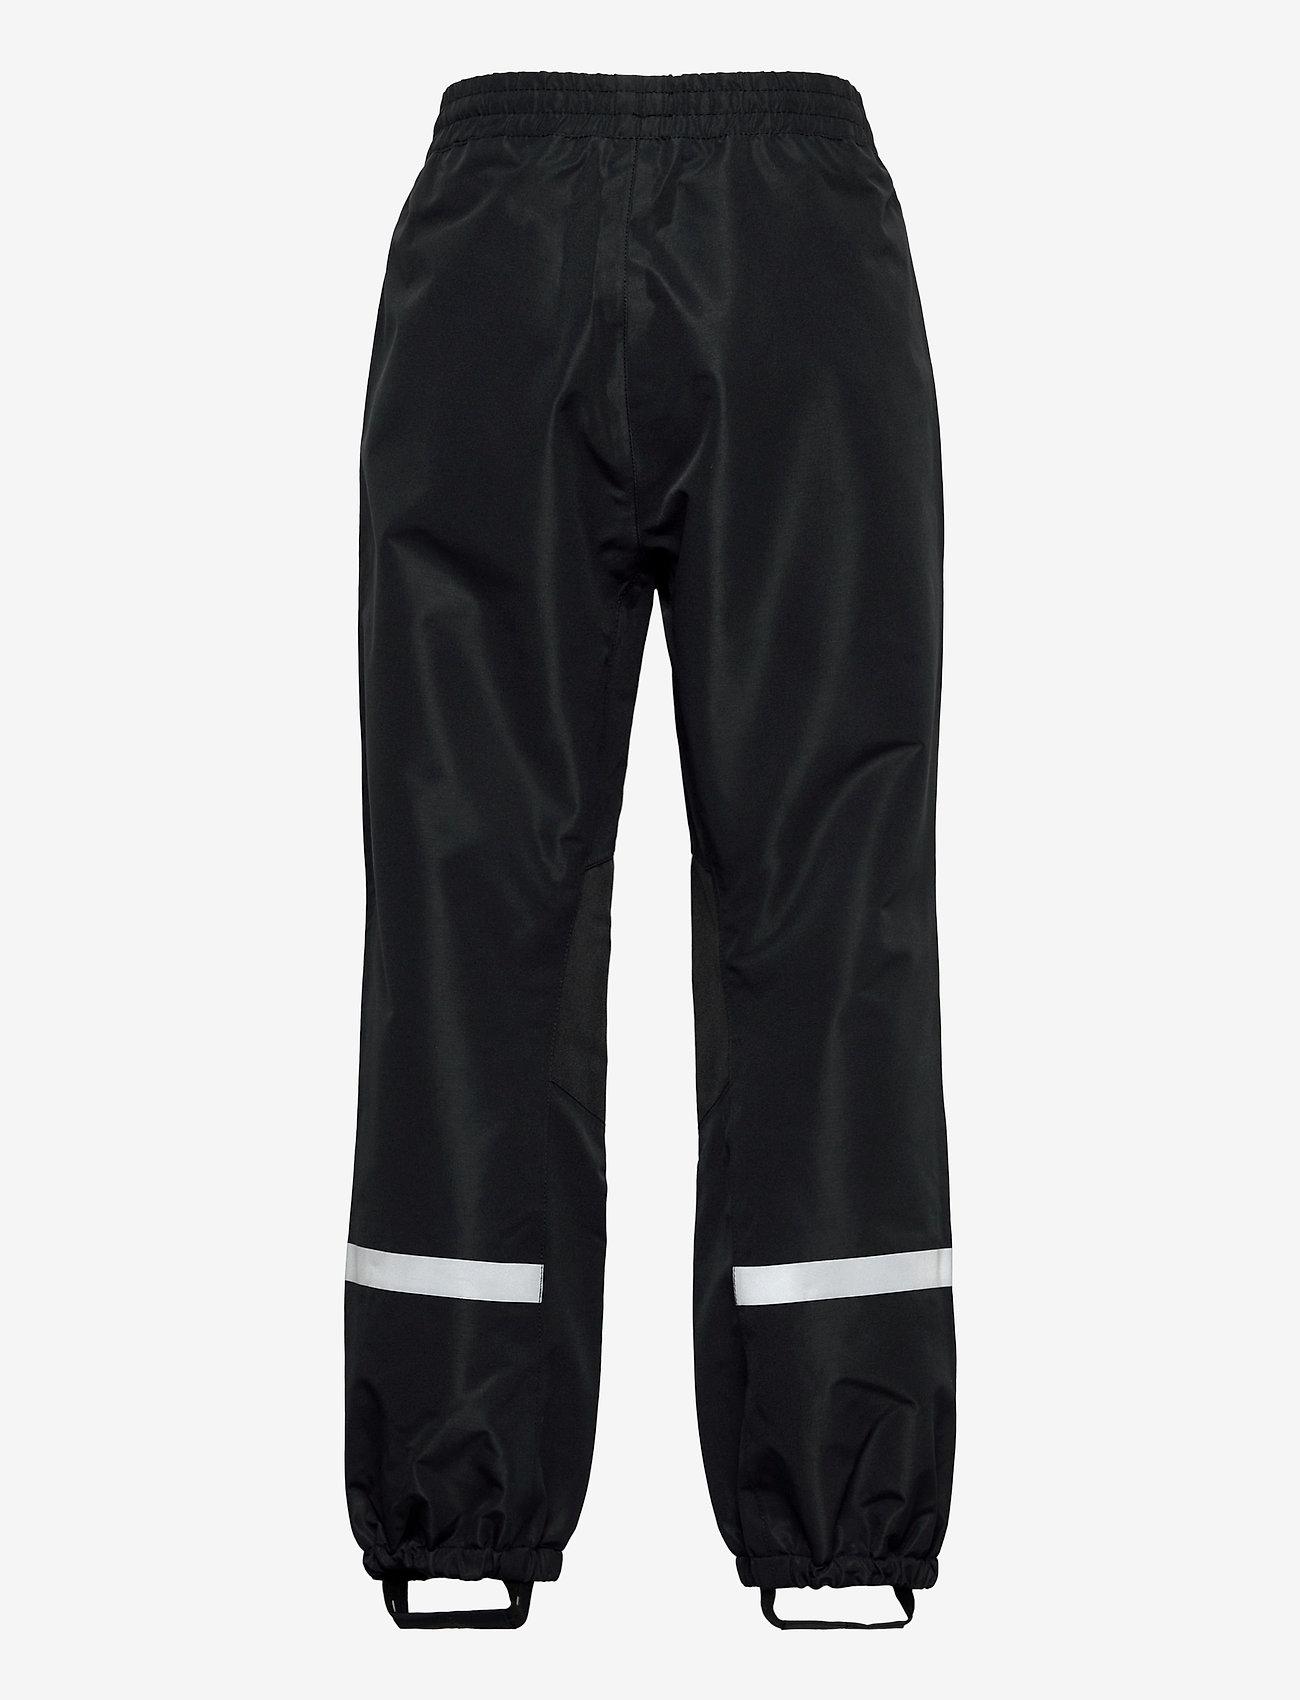 Tenson - Shore pants jr - shell- & regenbroeken - black - 1